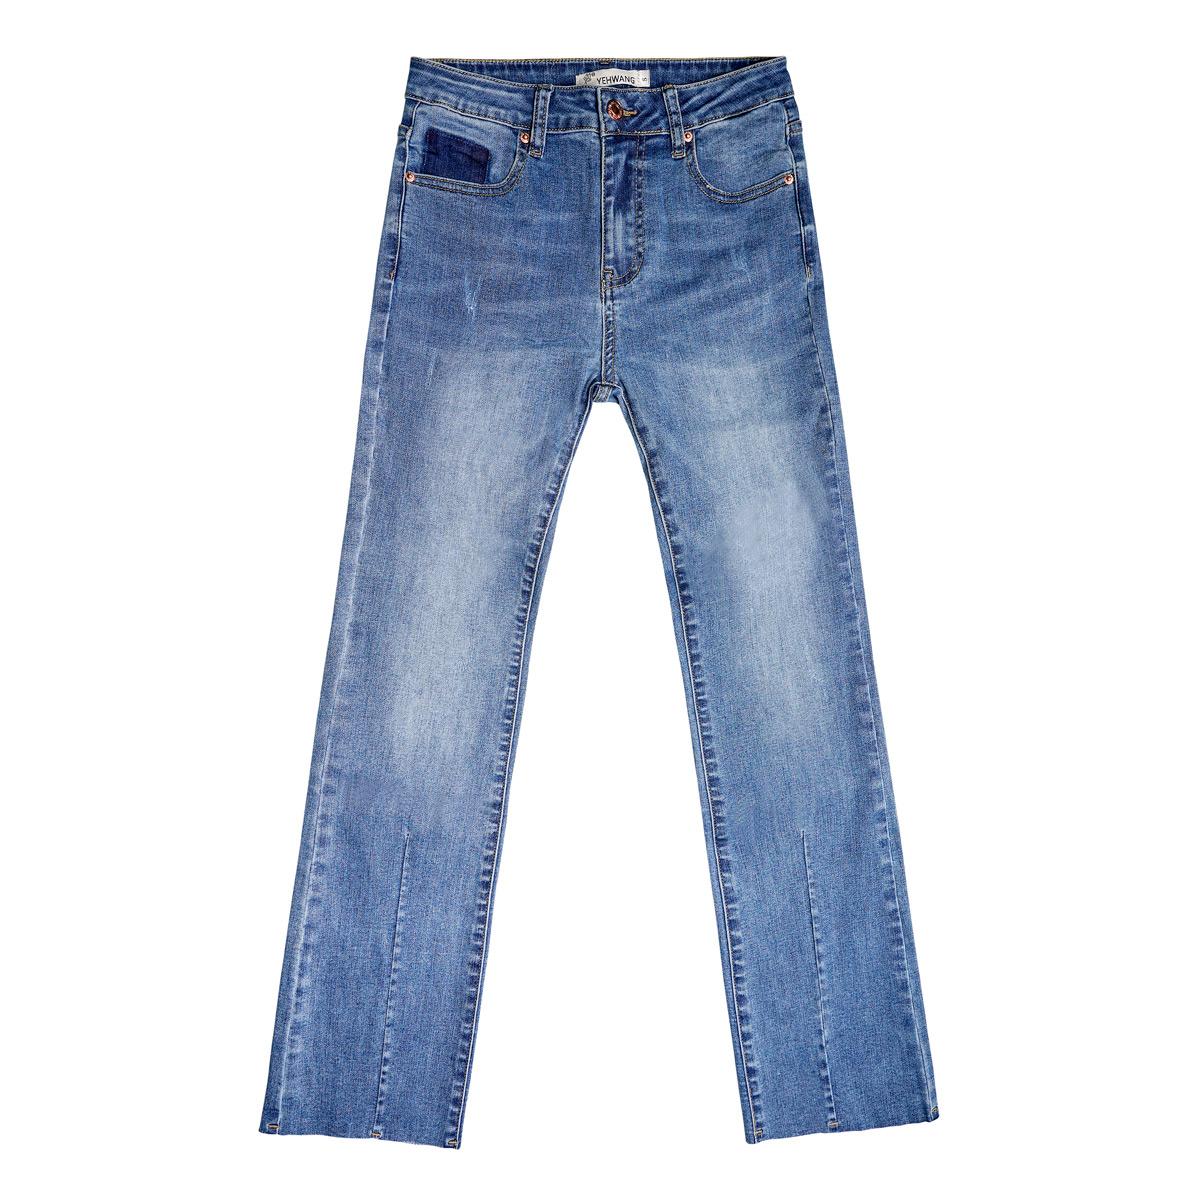 Enkellange stretch jeans